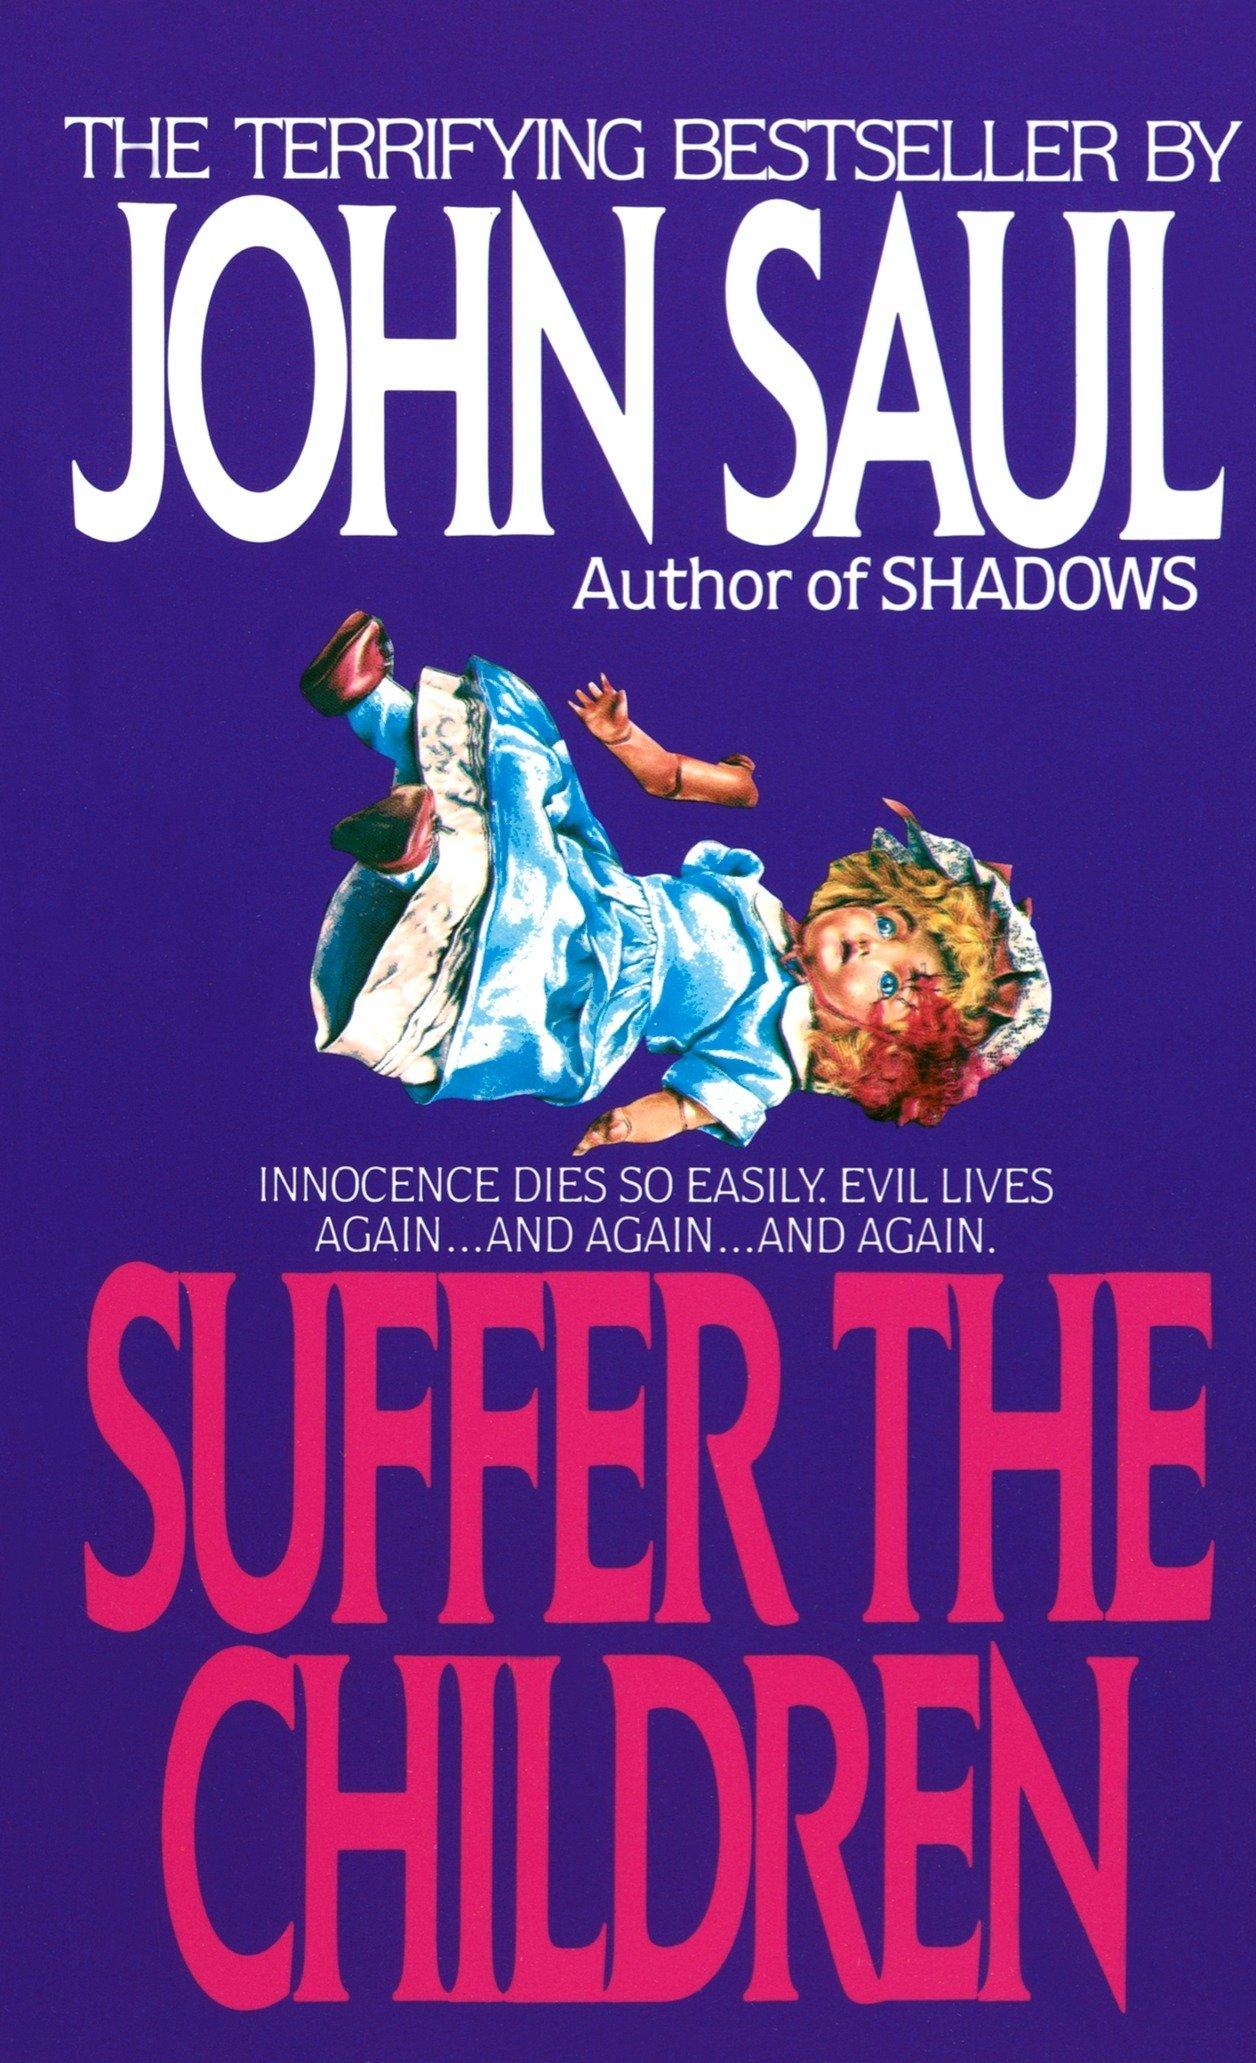 the homing john saul